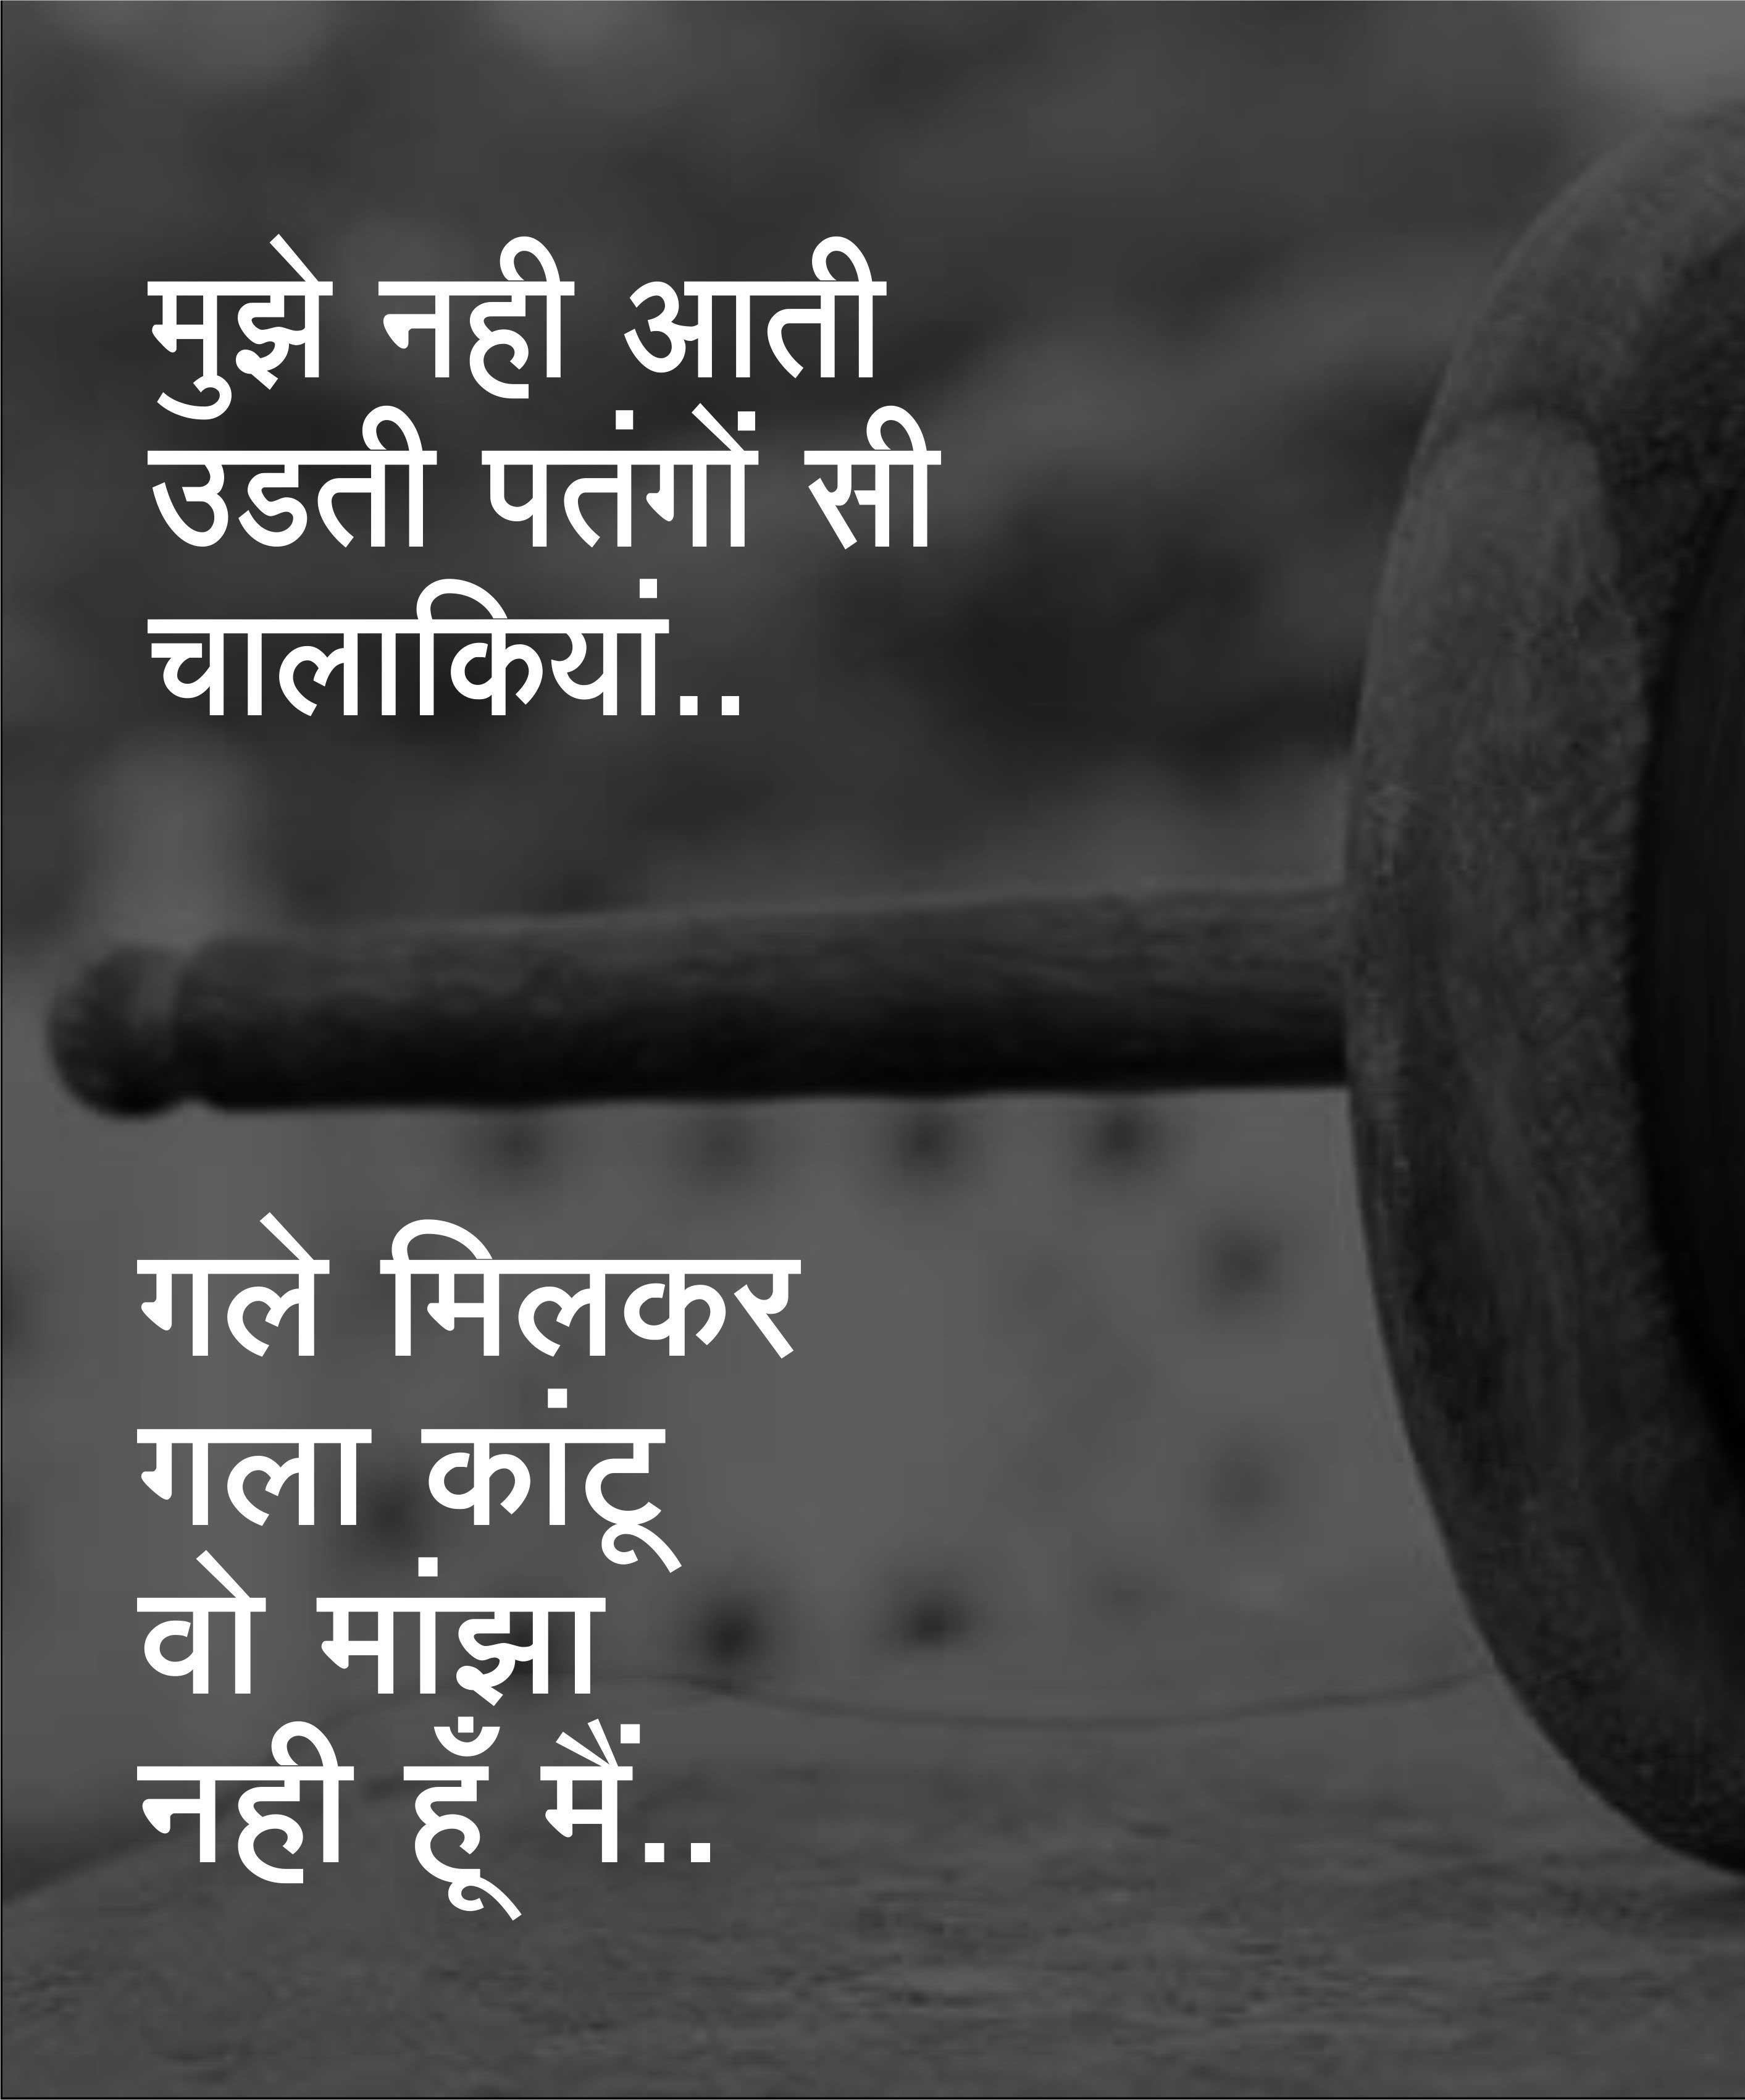 Hindi Boys Attitude Status Photo Wallpaper Free